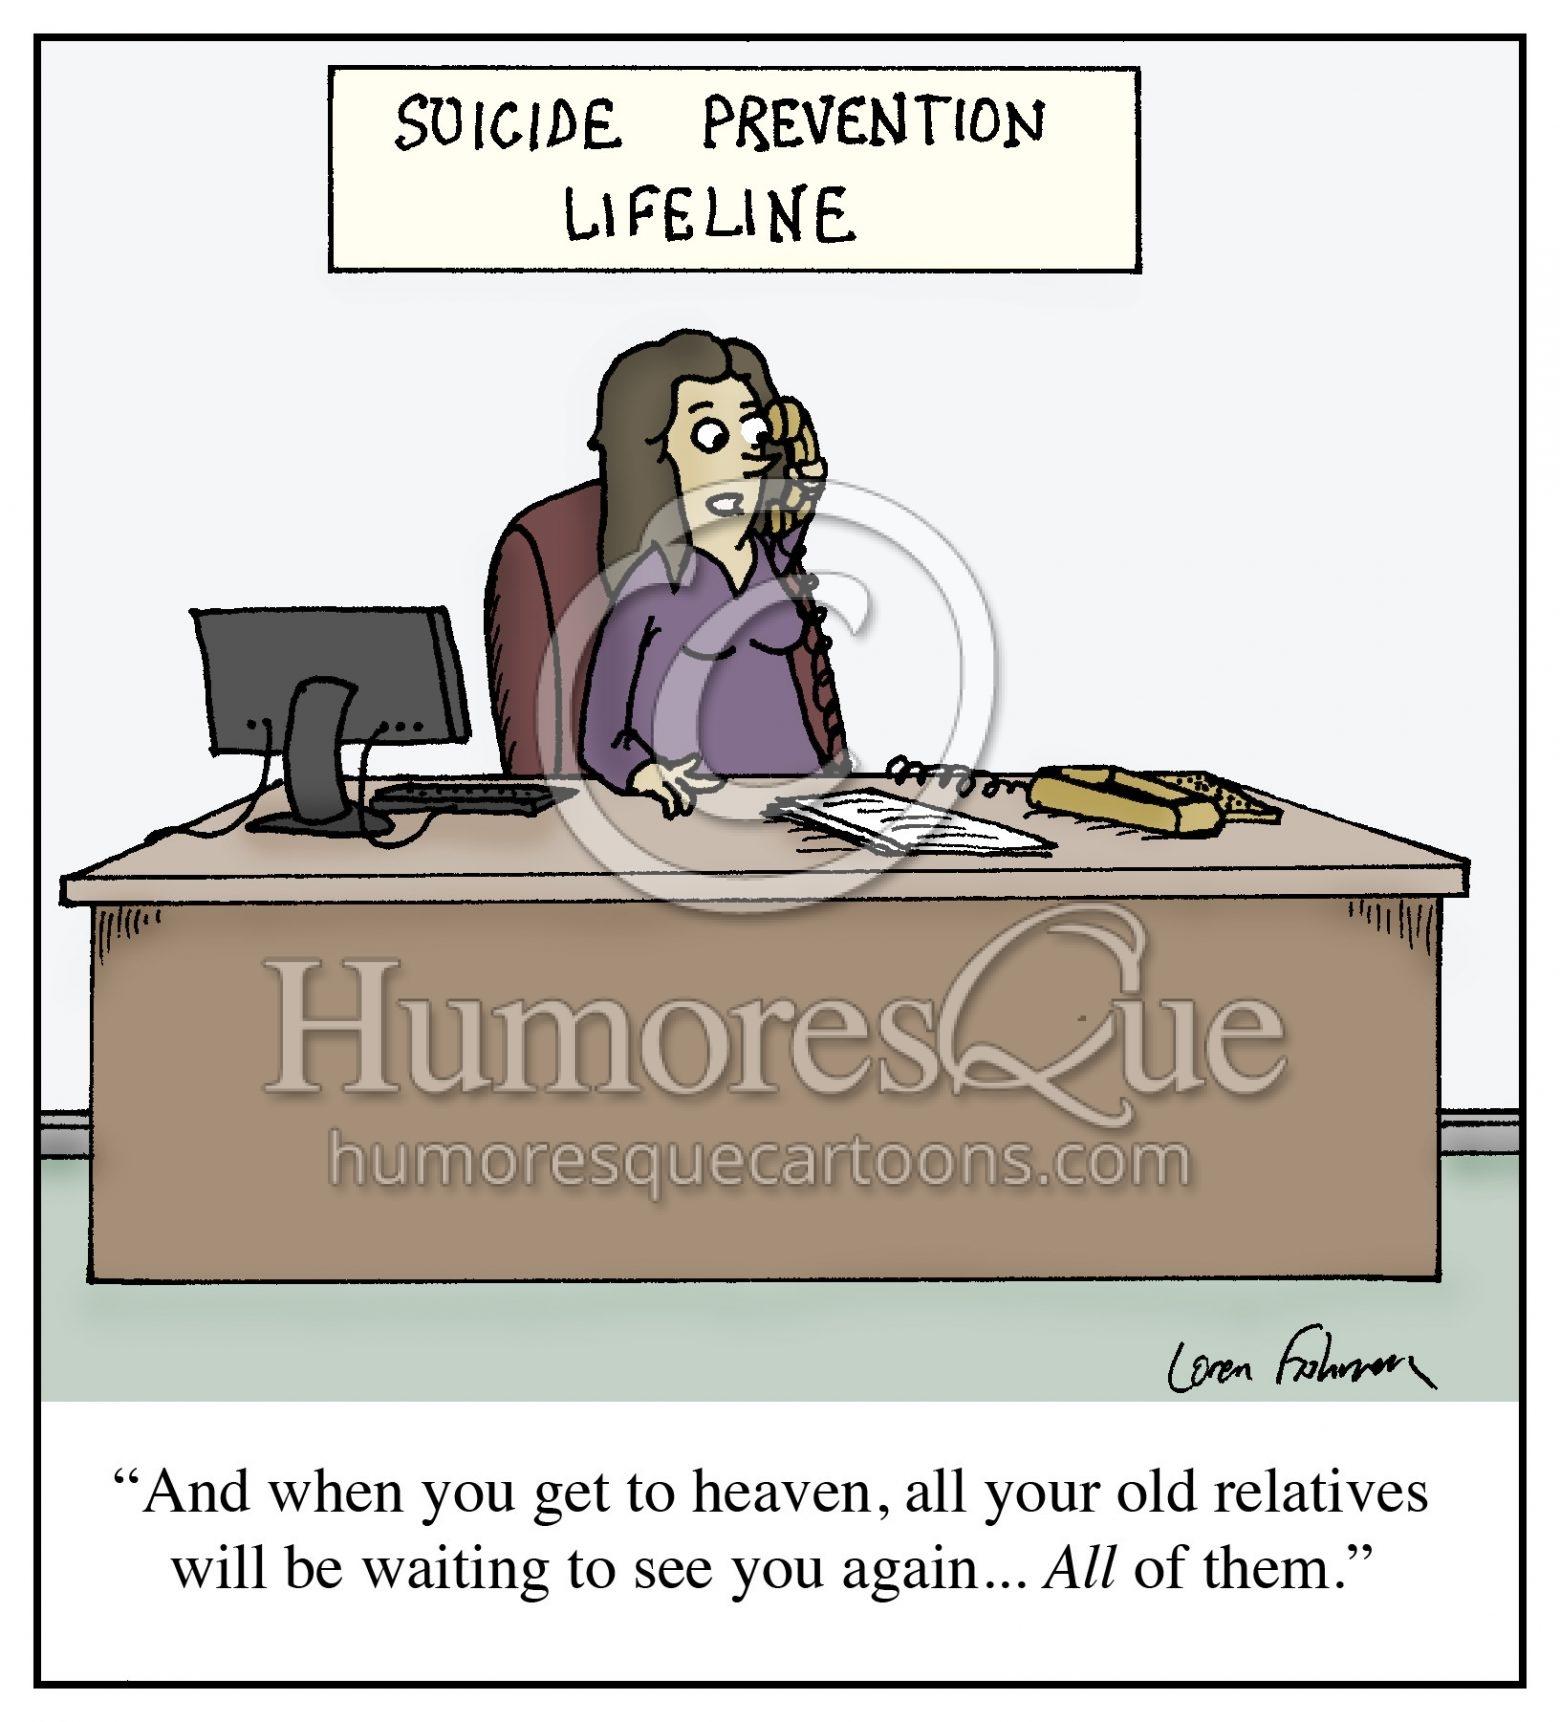 suicide prevention hotline cartoon